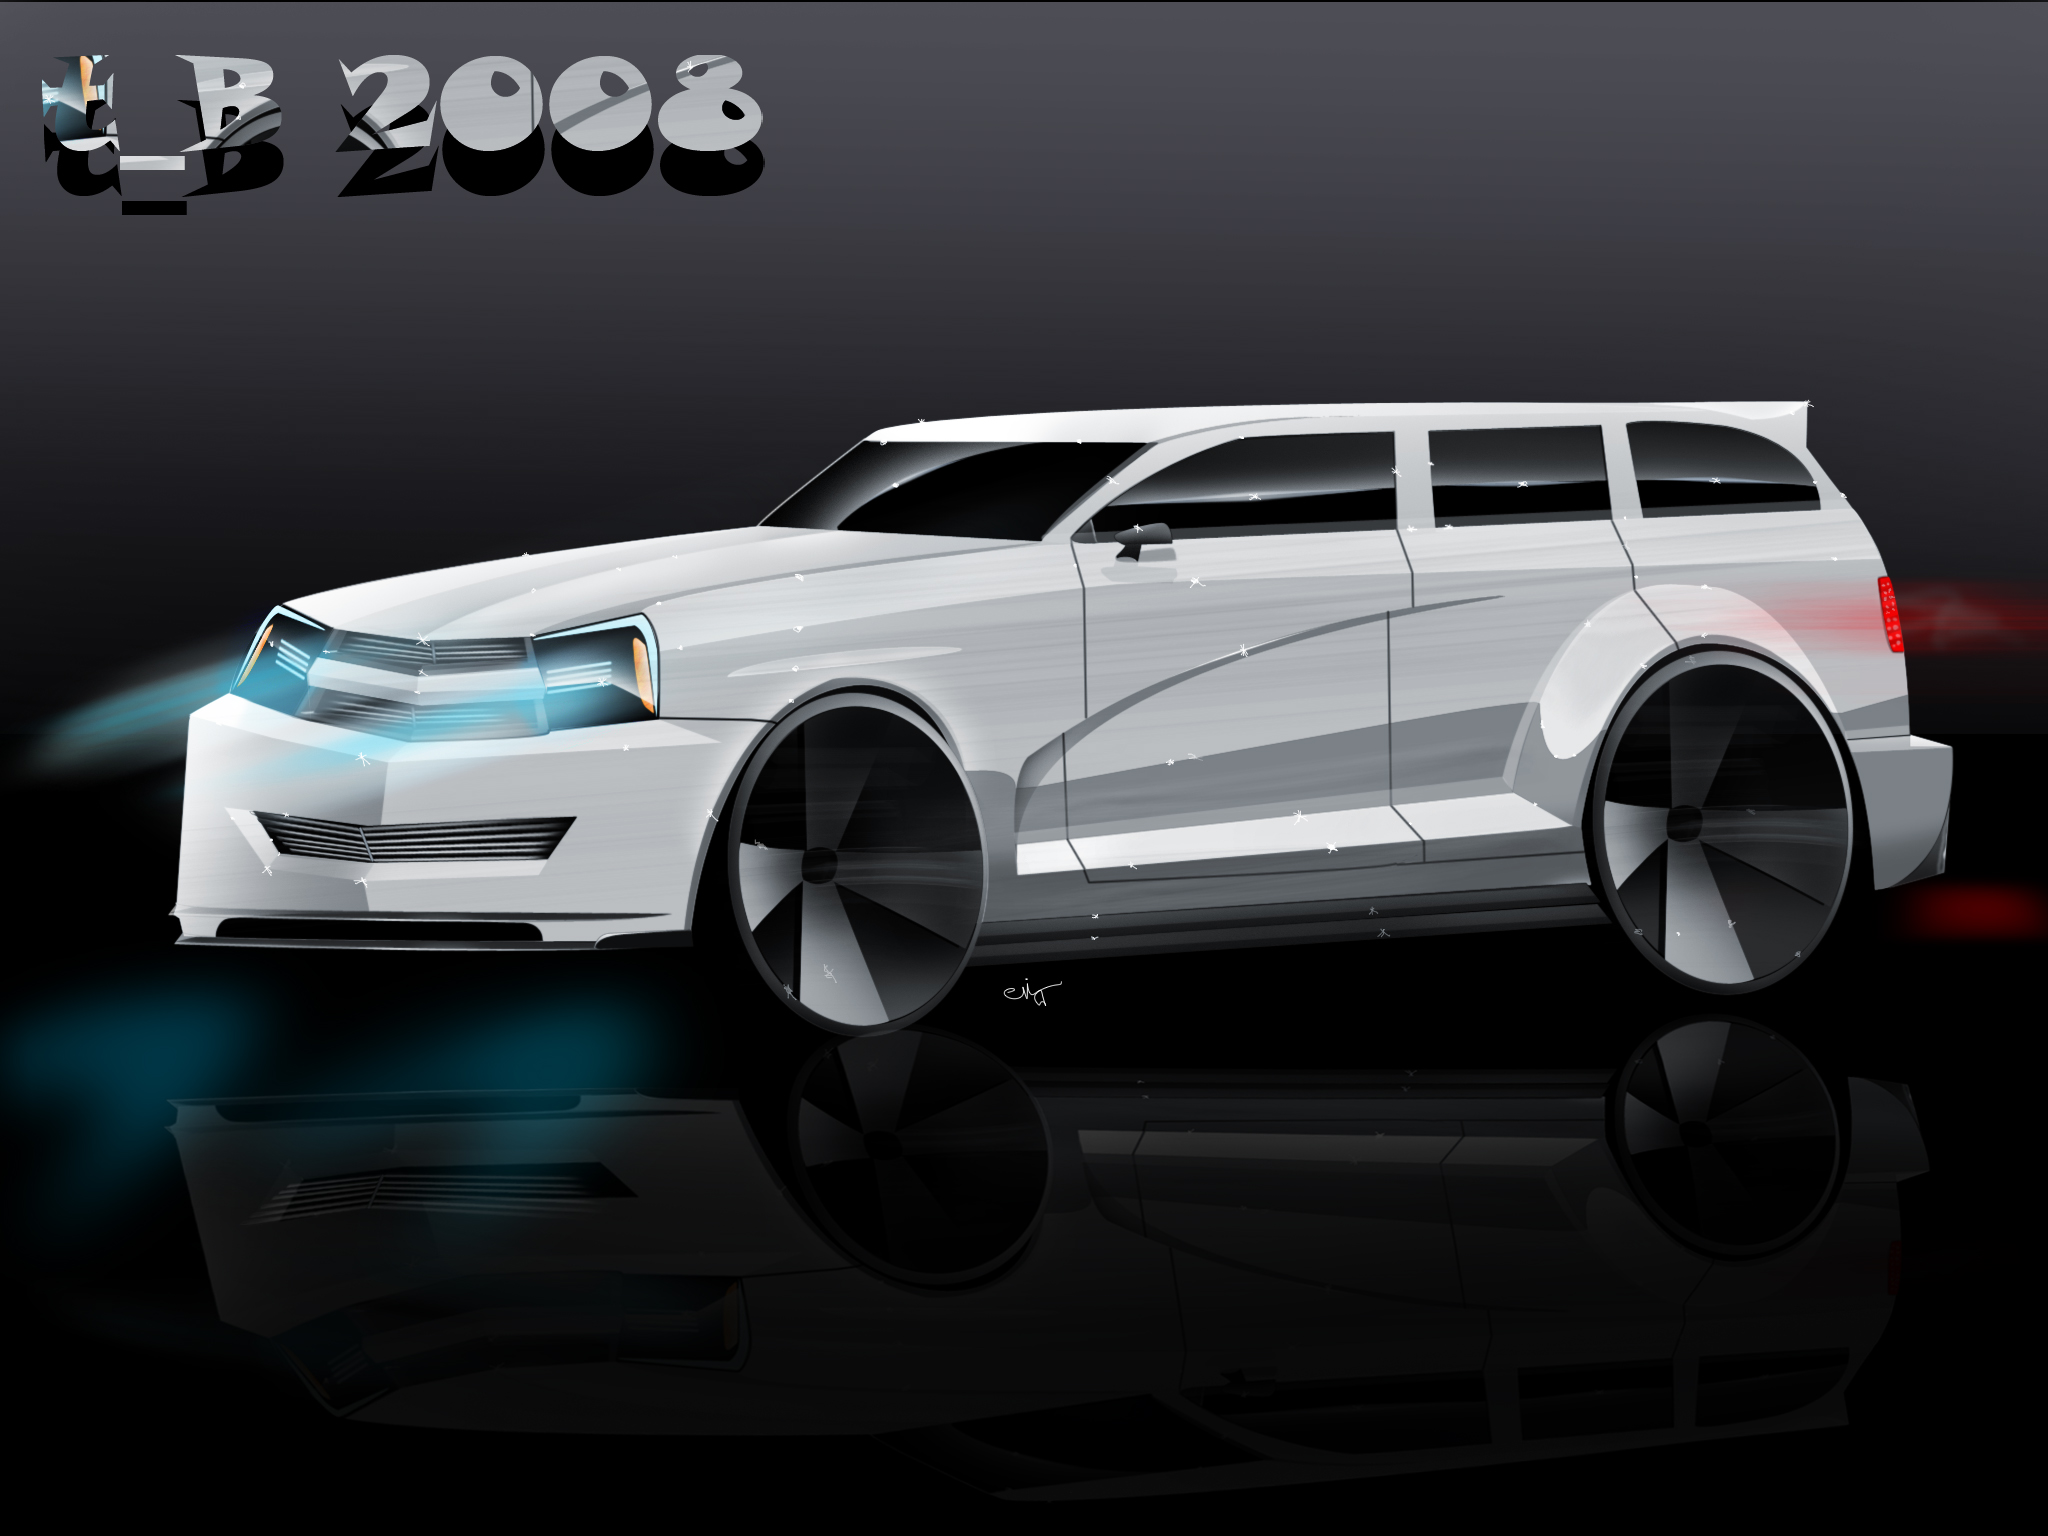 Design For Future Suv By Eliasoo On Deviantart